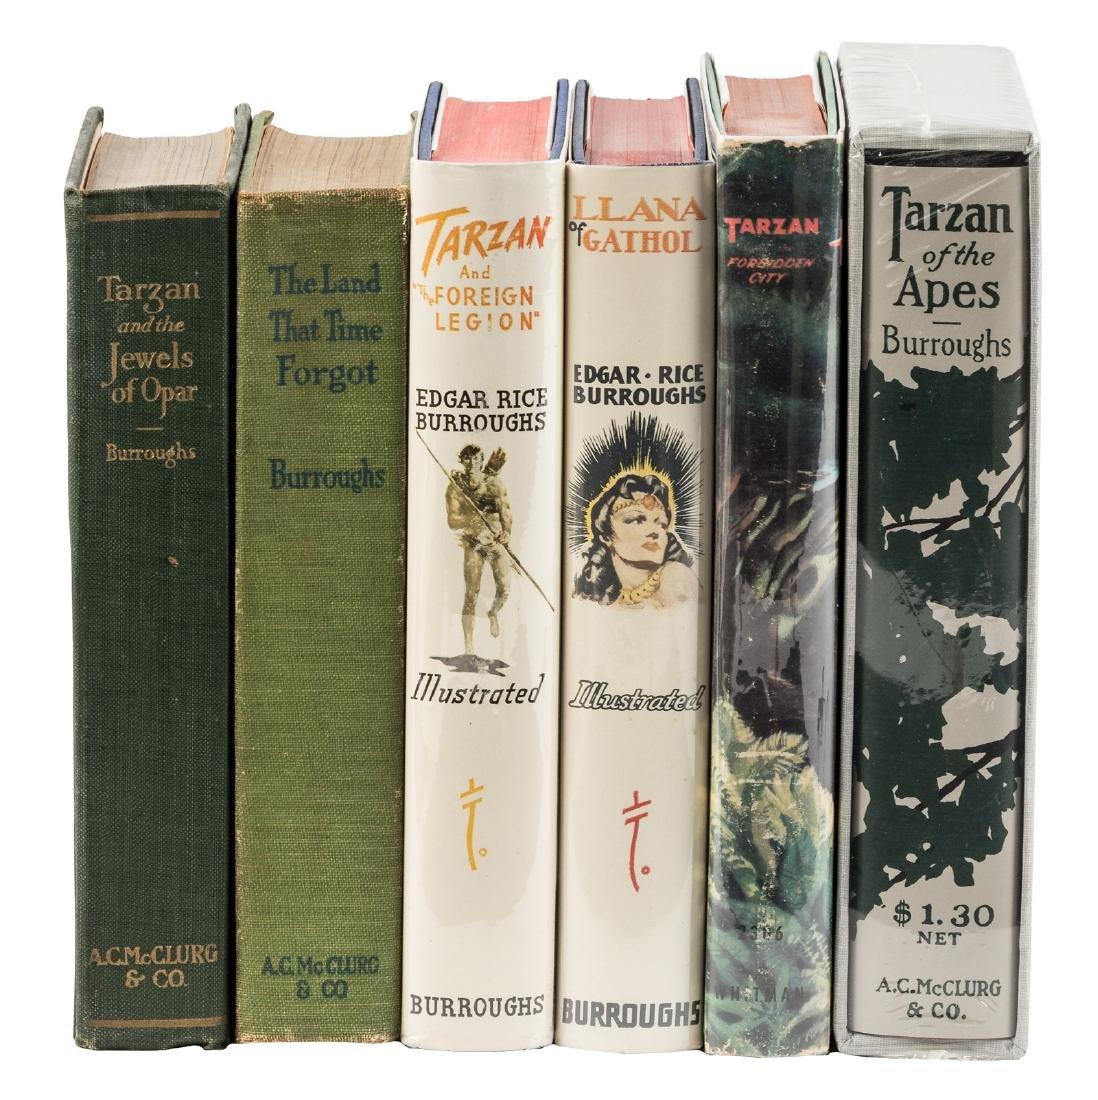 Includes 2 fine Edgar Rice Burroughs, Inc. vols.